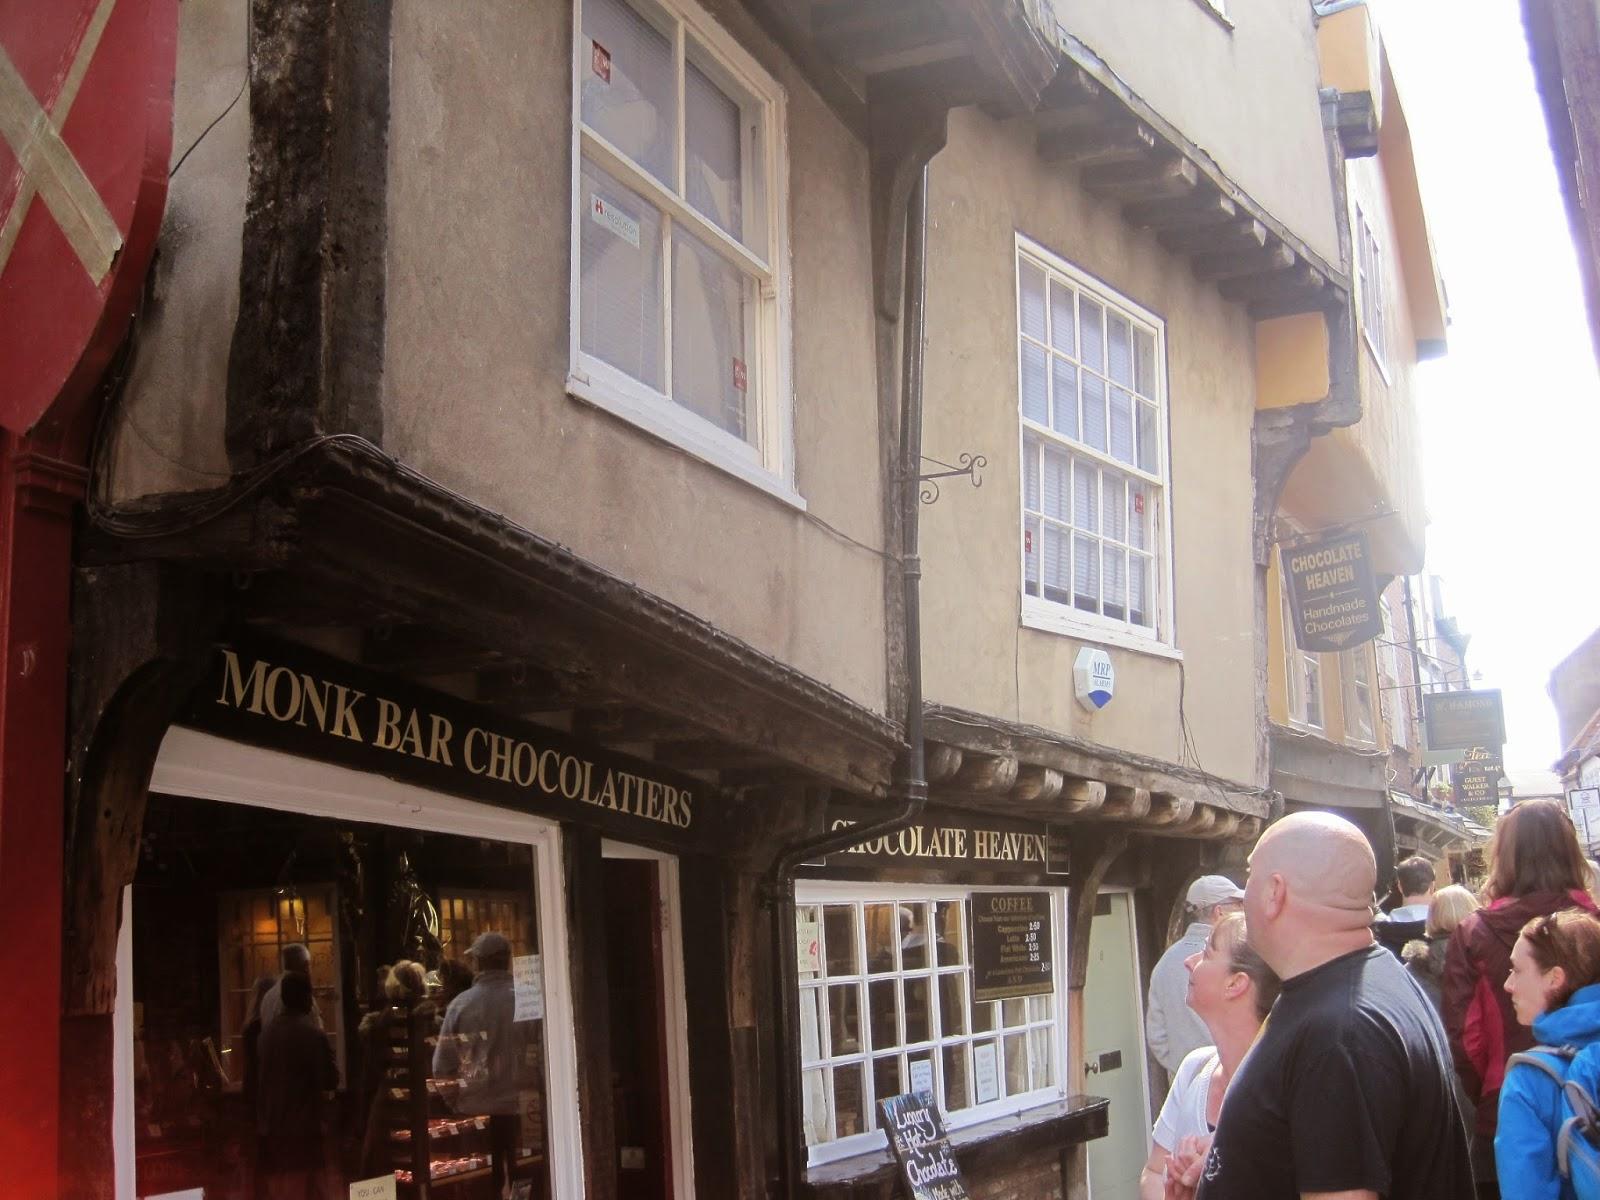 York England – Part 2